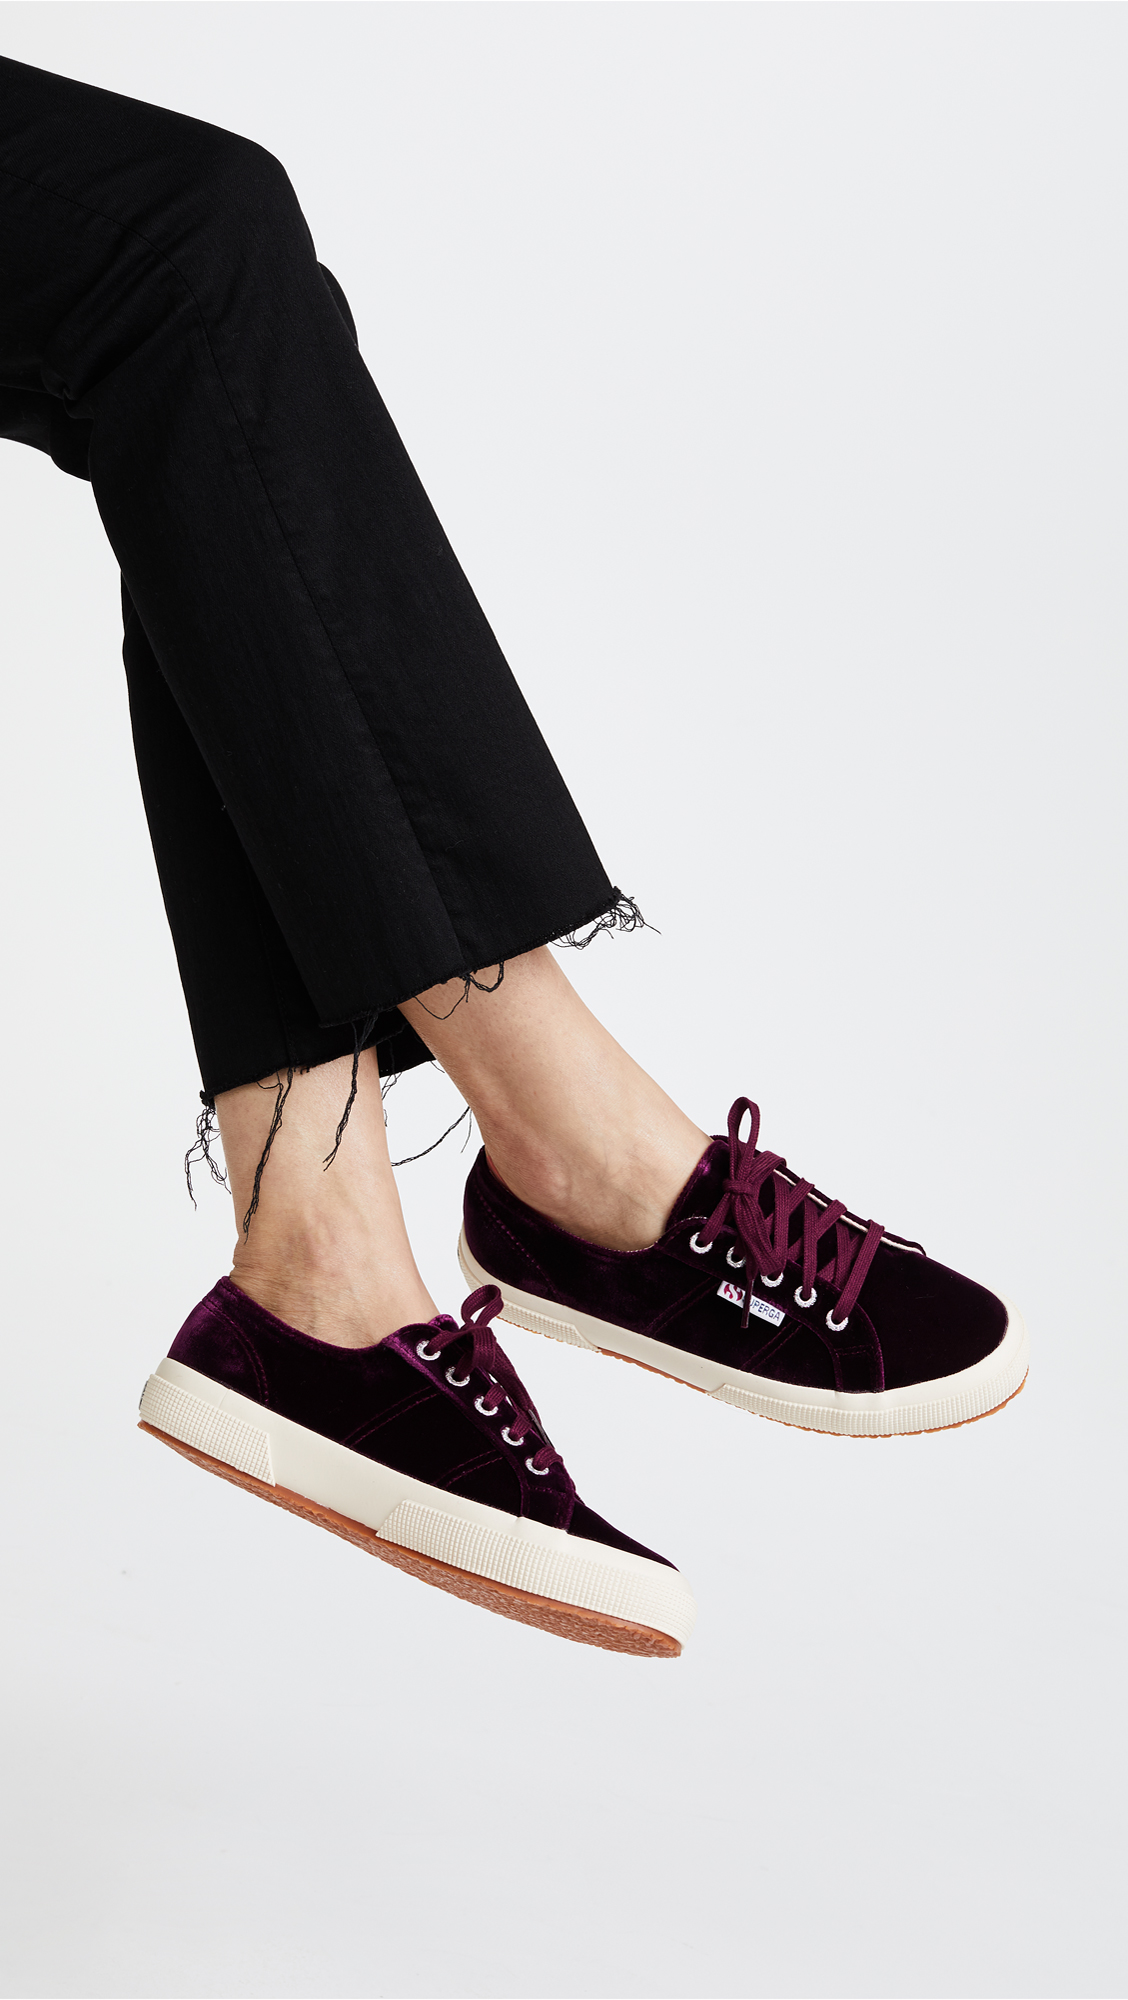 209120fde6aa17 Superga 2750 Velvet Sneakers